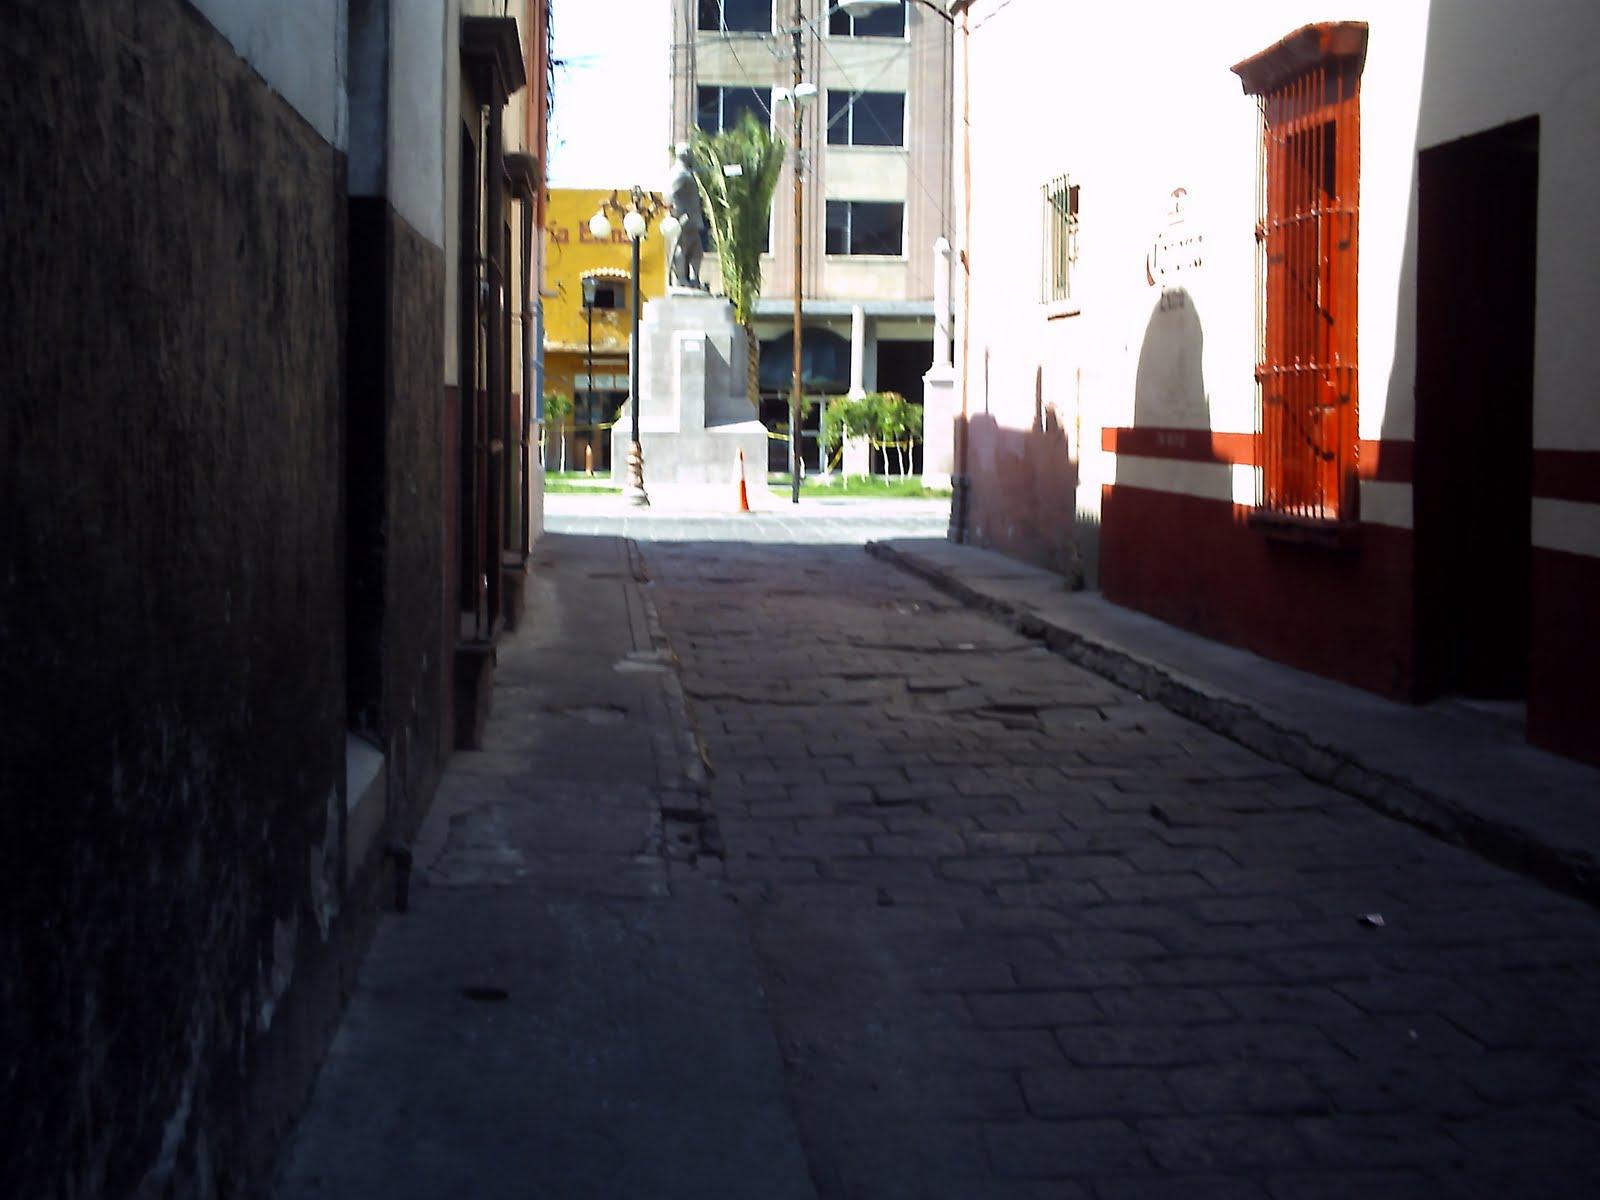 sexo san luis potosí Eqiiz alameda plaza mariachis